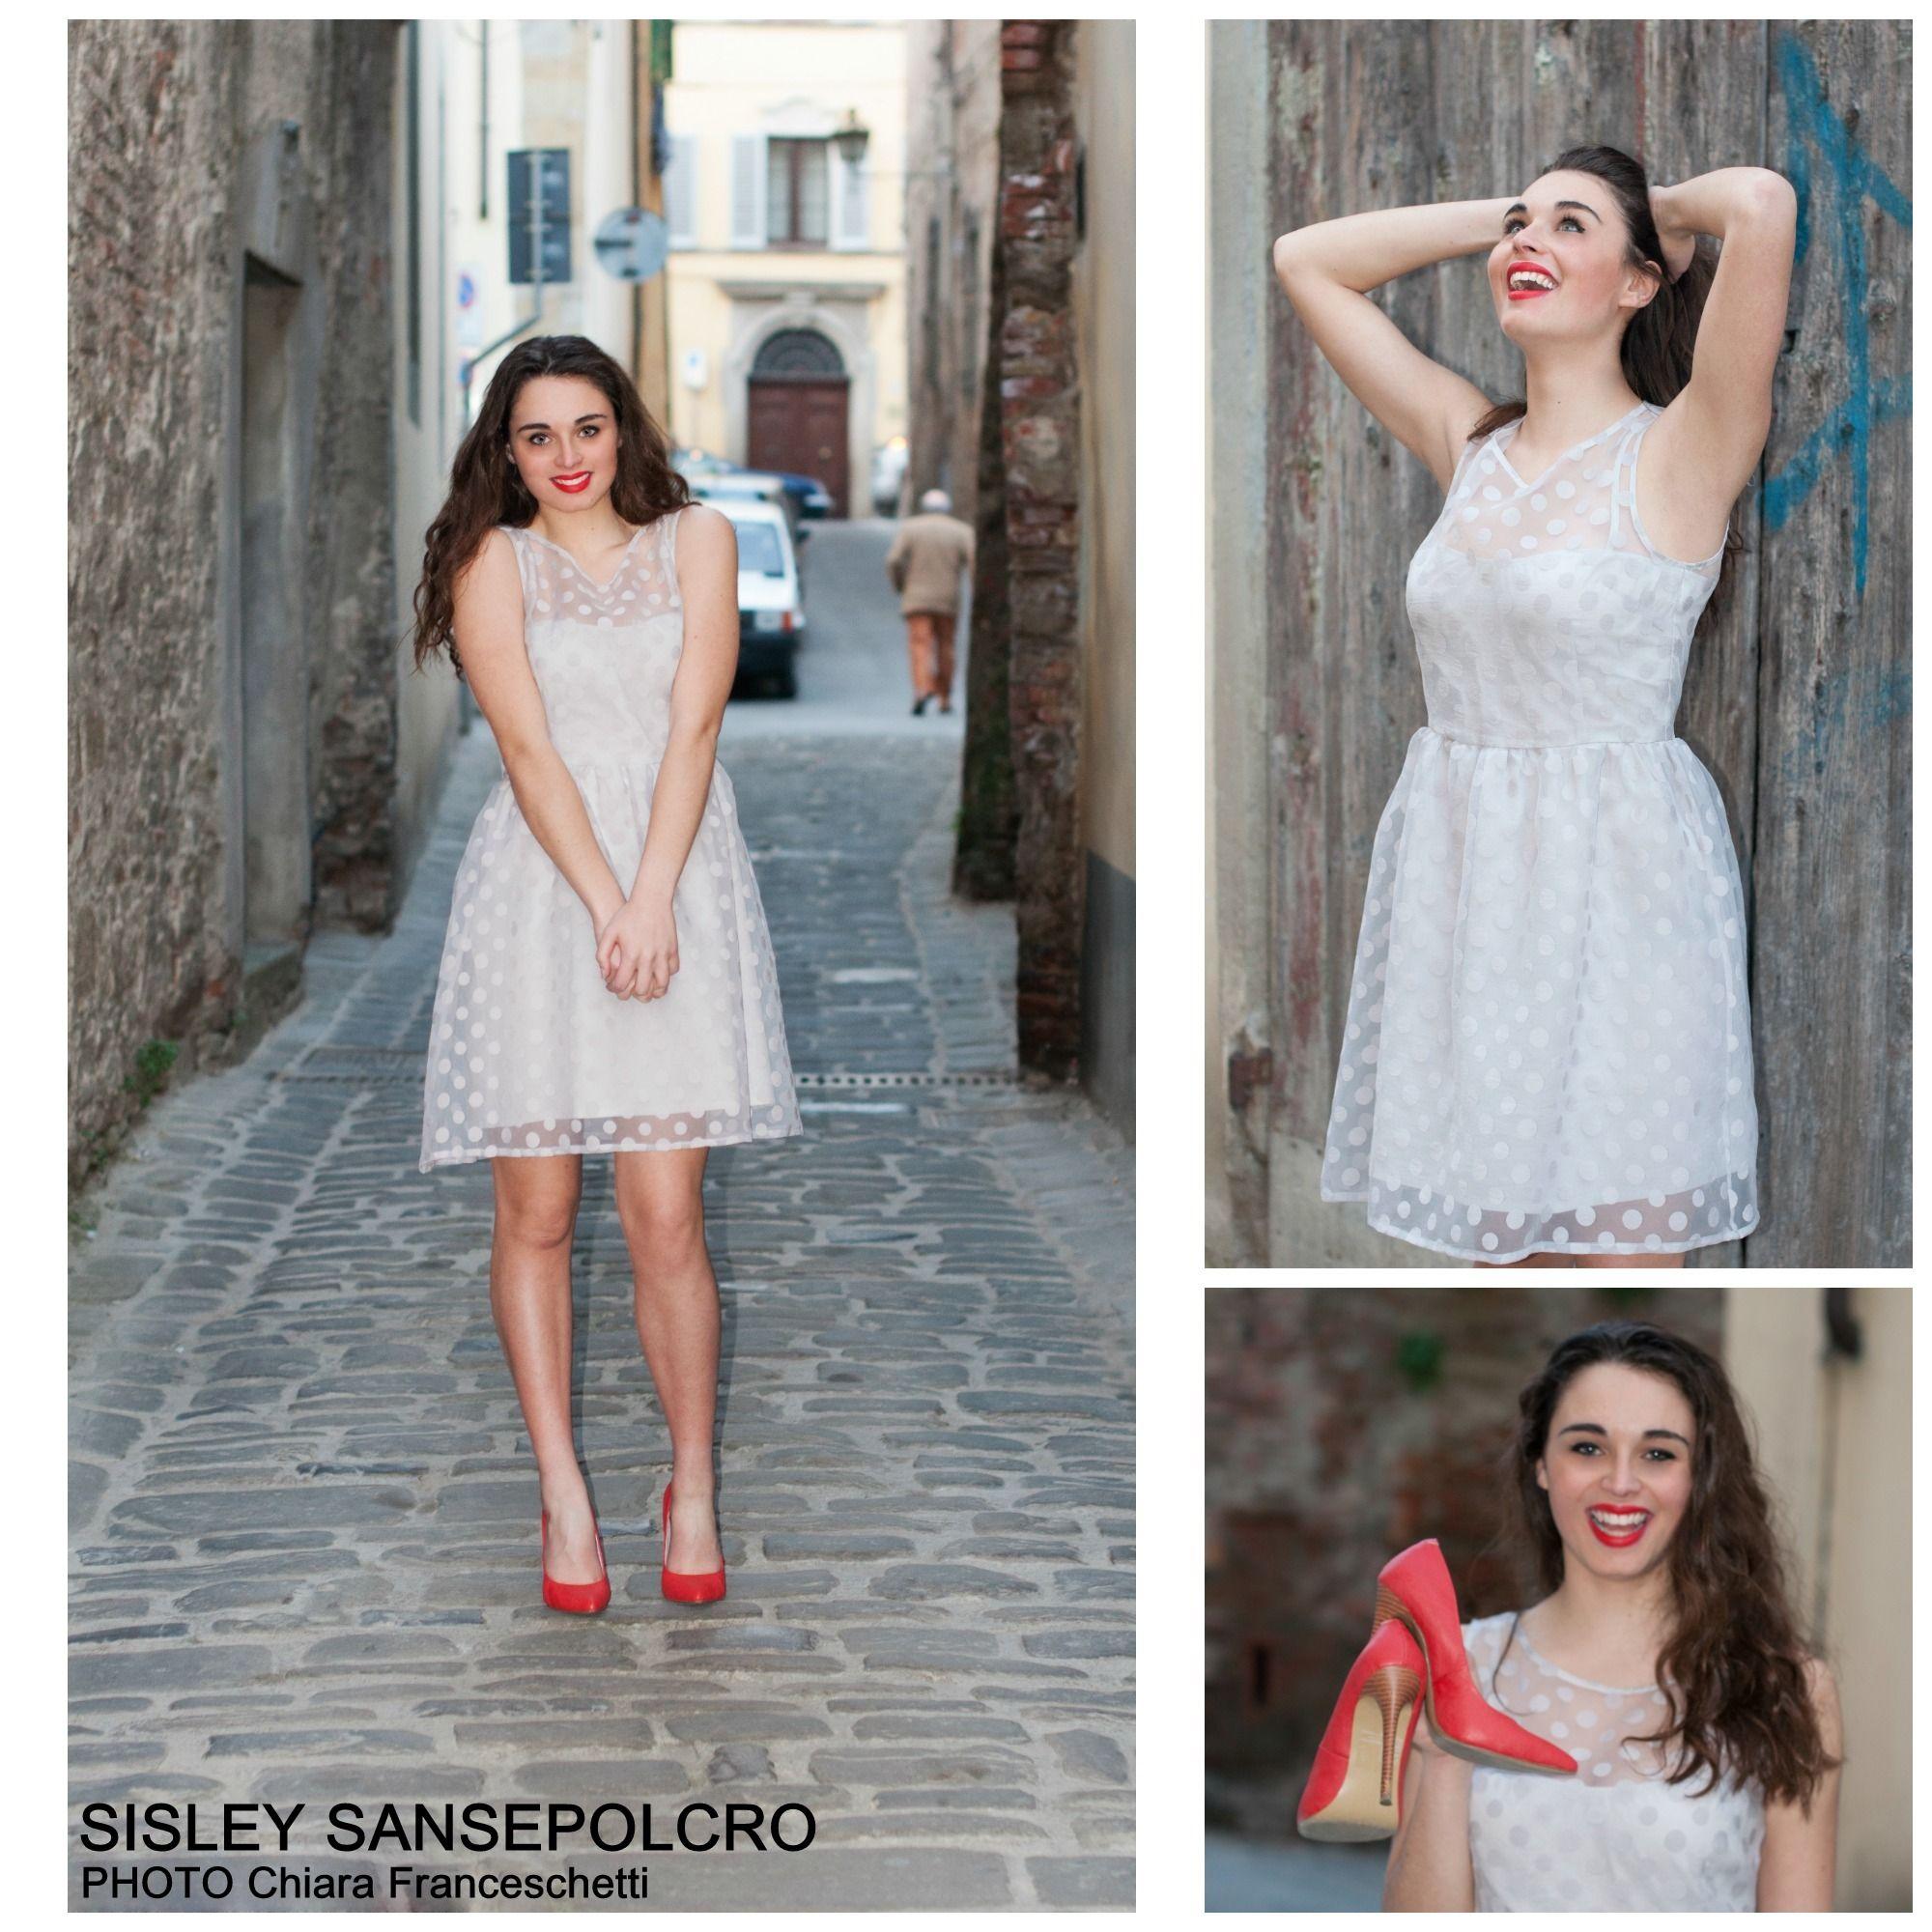 Sisley Sansepolcro Shooting spring2014